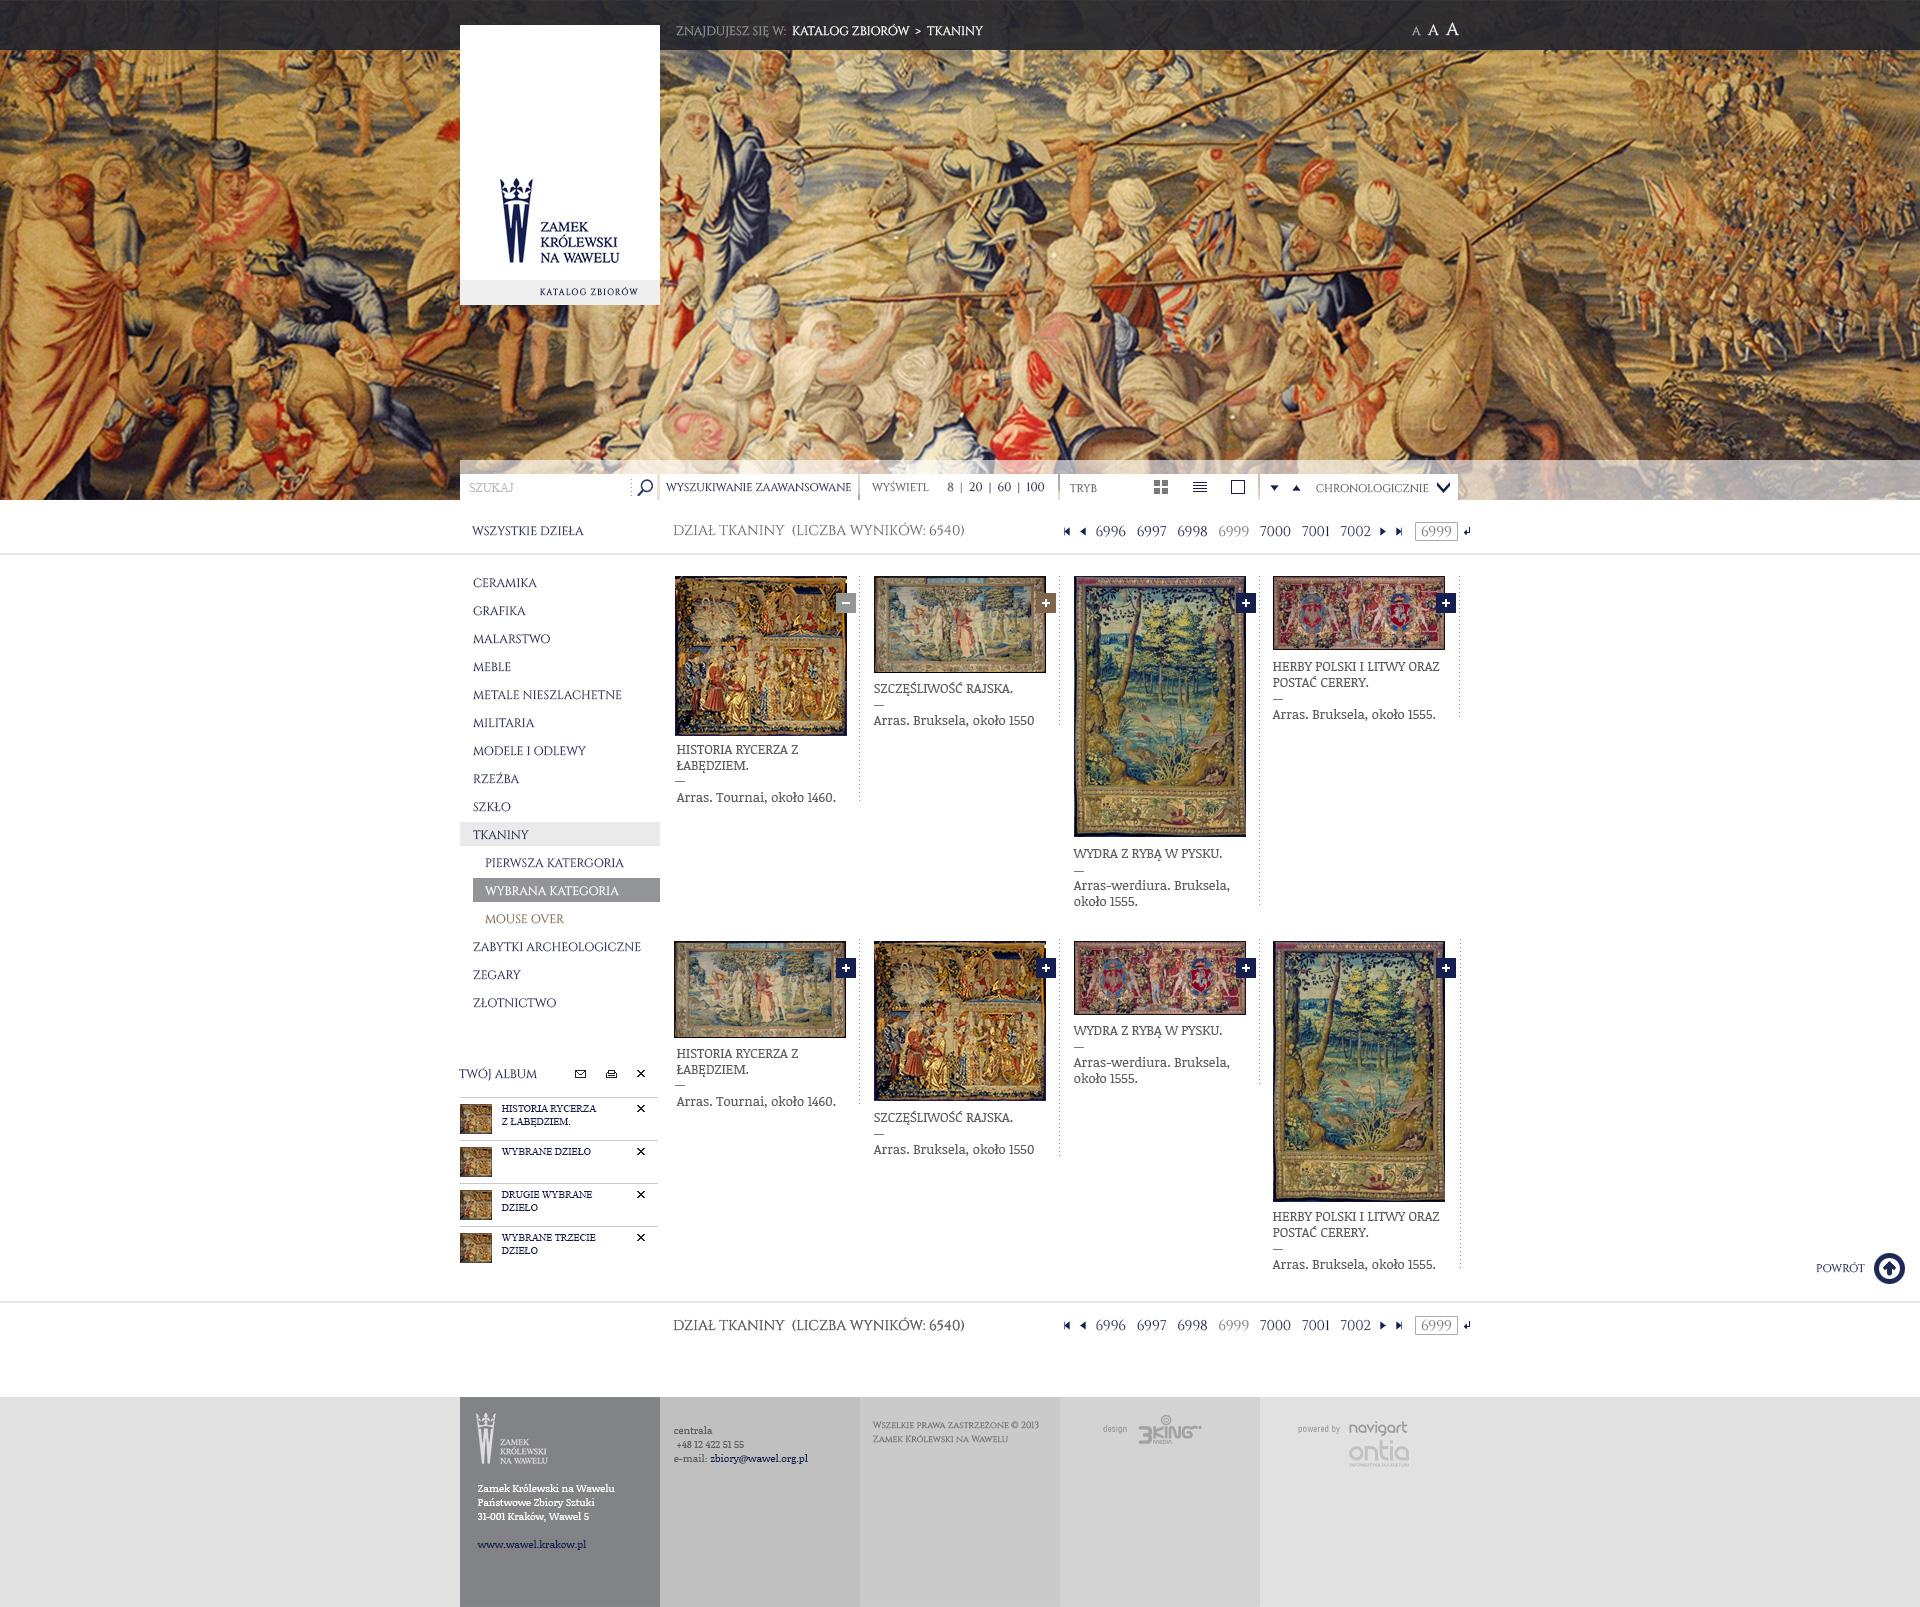 Zamek na Wawelu - Katalog zbiorow - stona katalogu